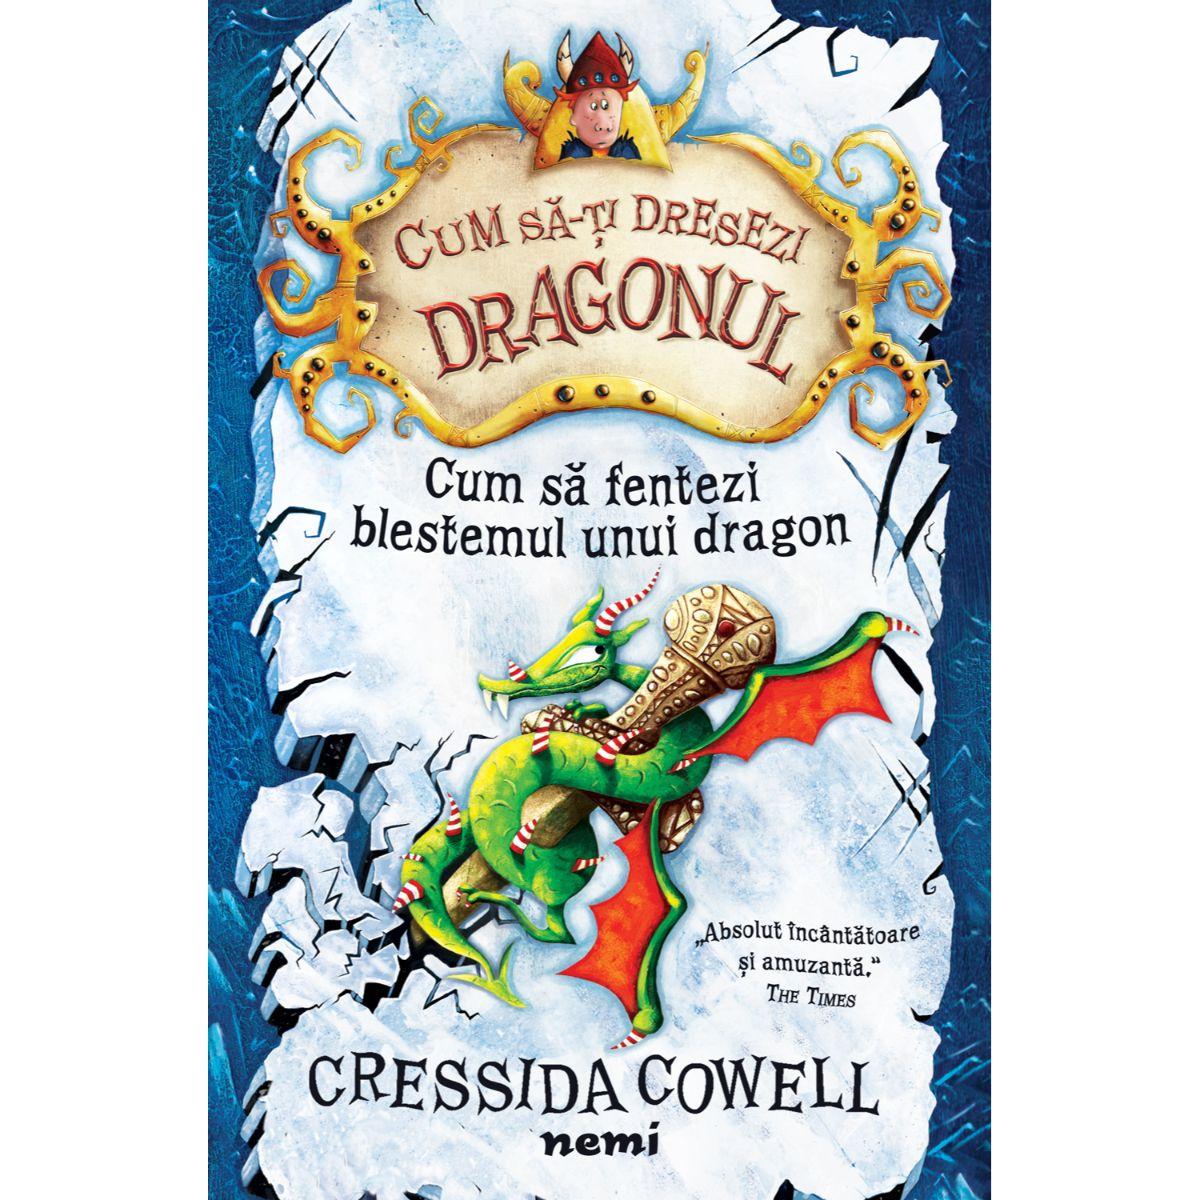 Cum sa fentezi blestemul unui dragon, Cressida Cowell